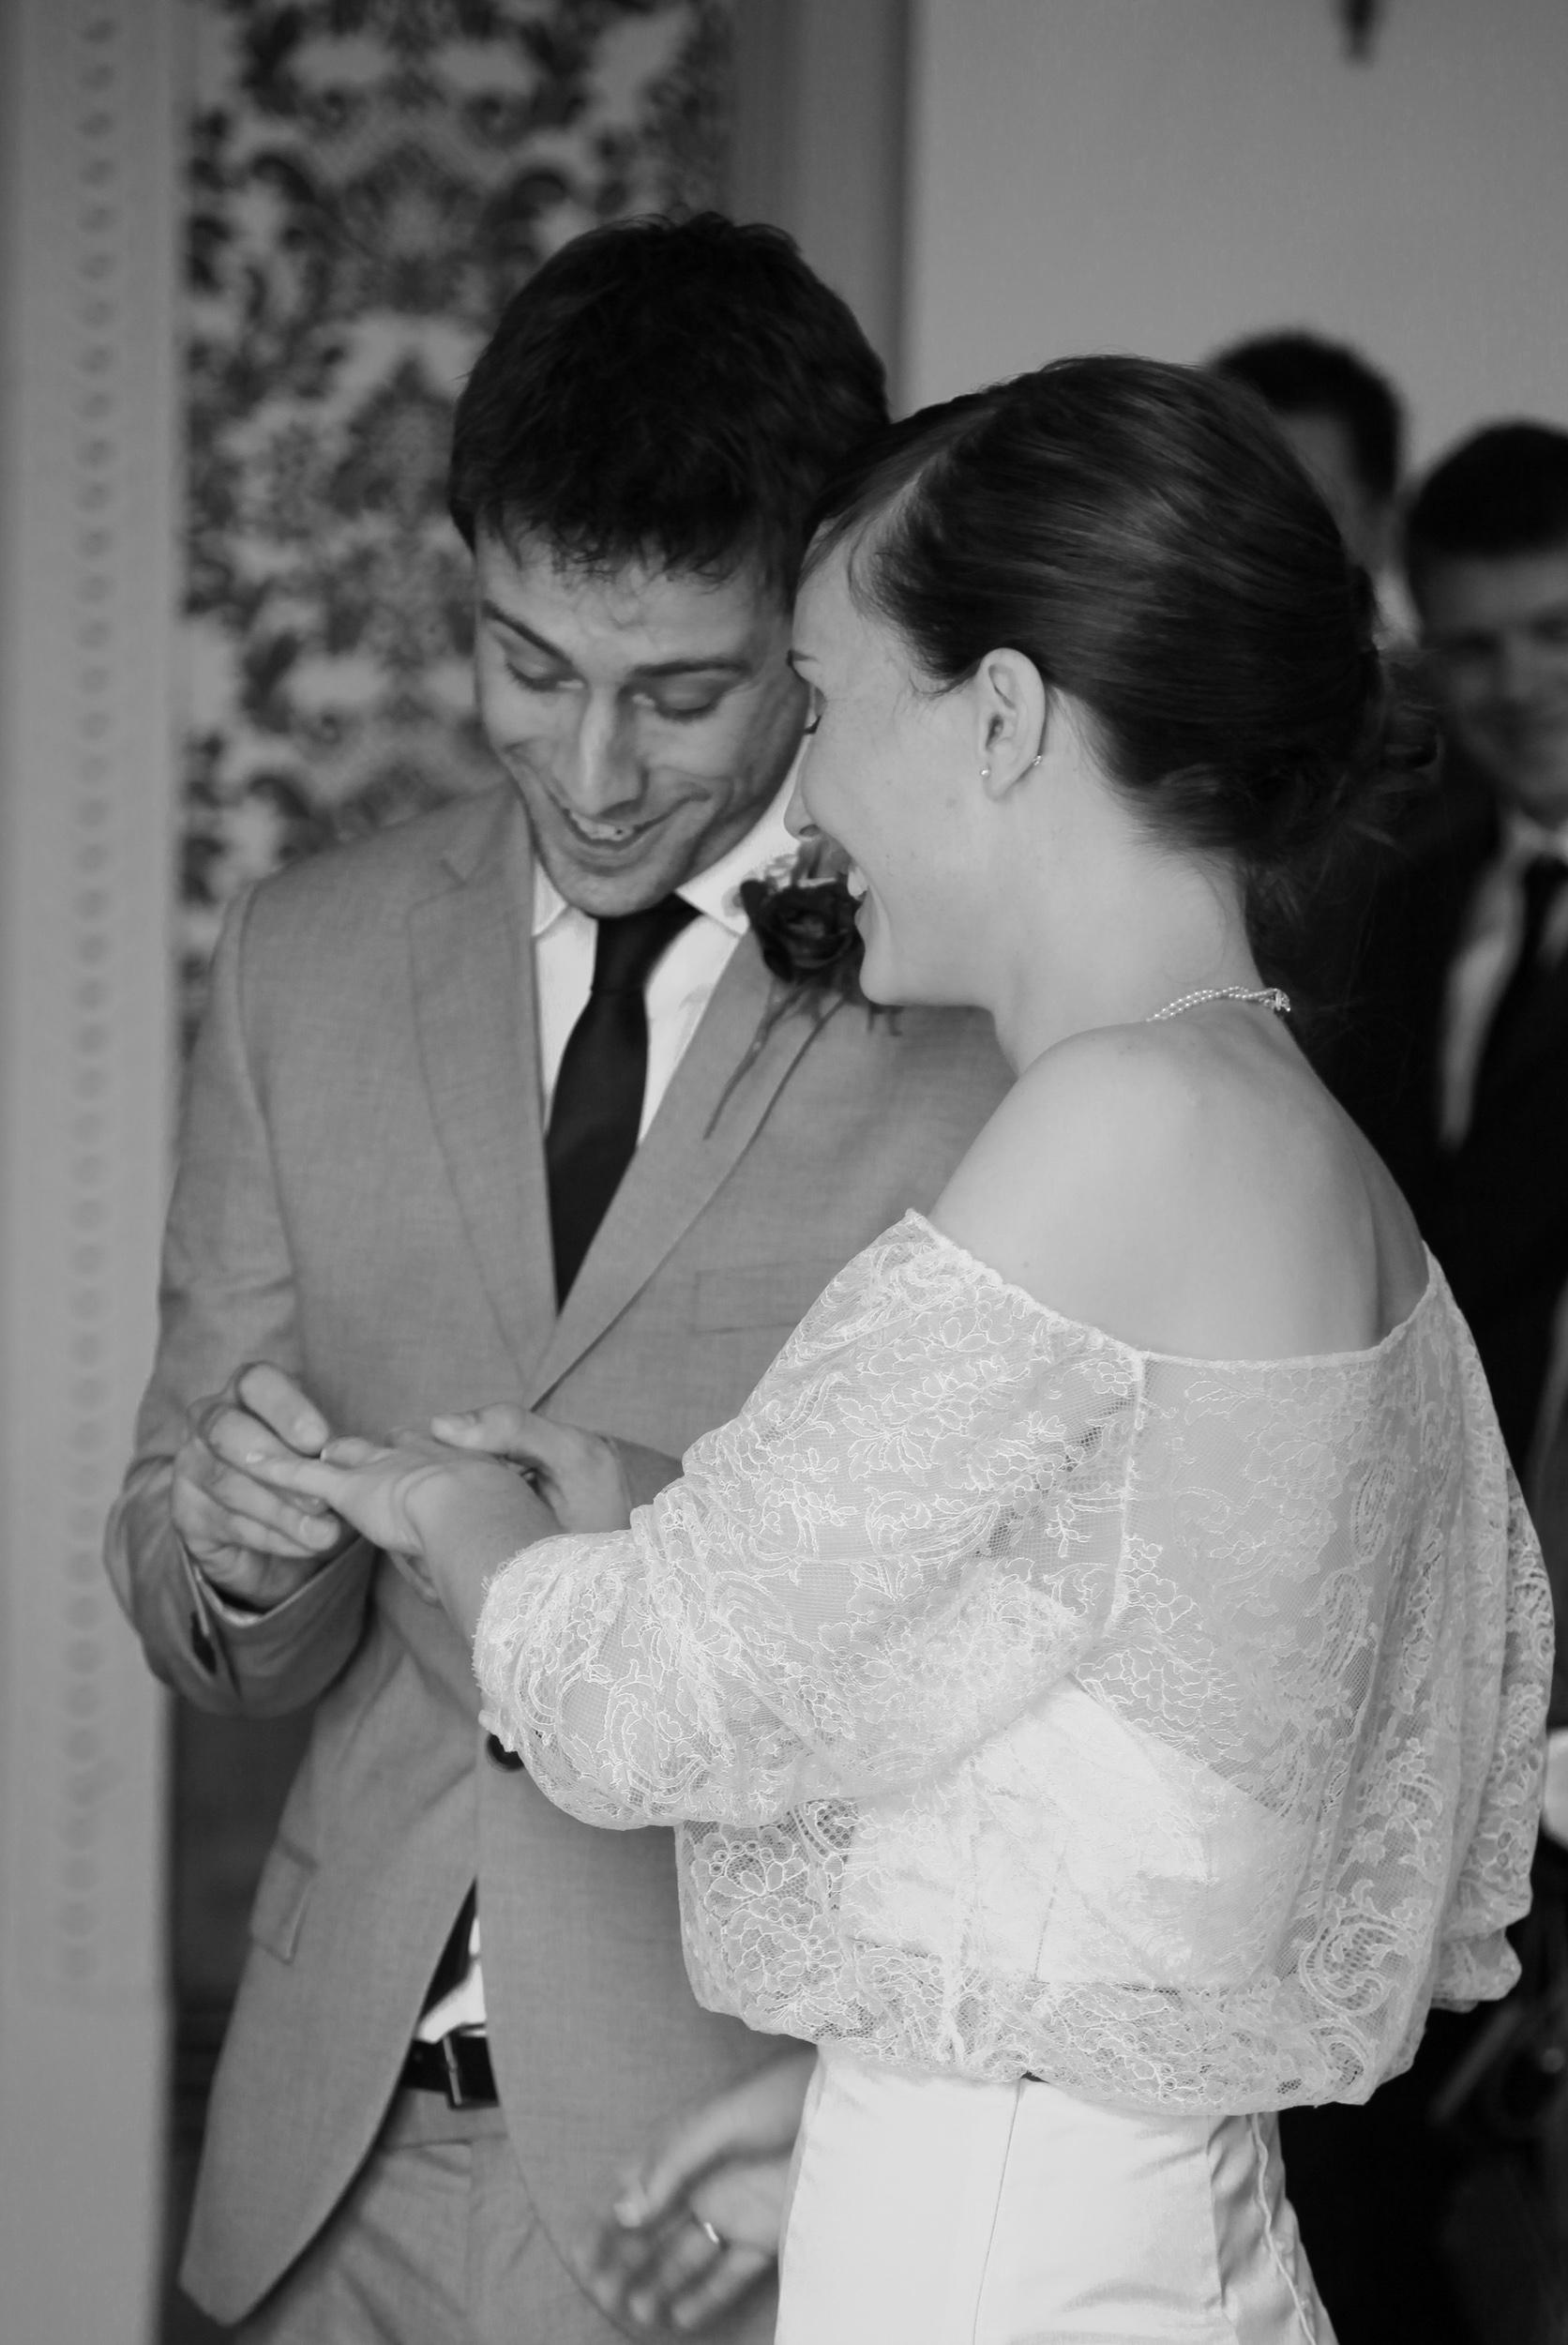 Alexandra-bespoke-wedding-dress-Kate-Beaumont-5.jpg